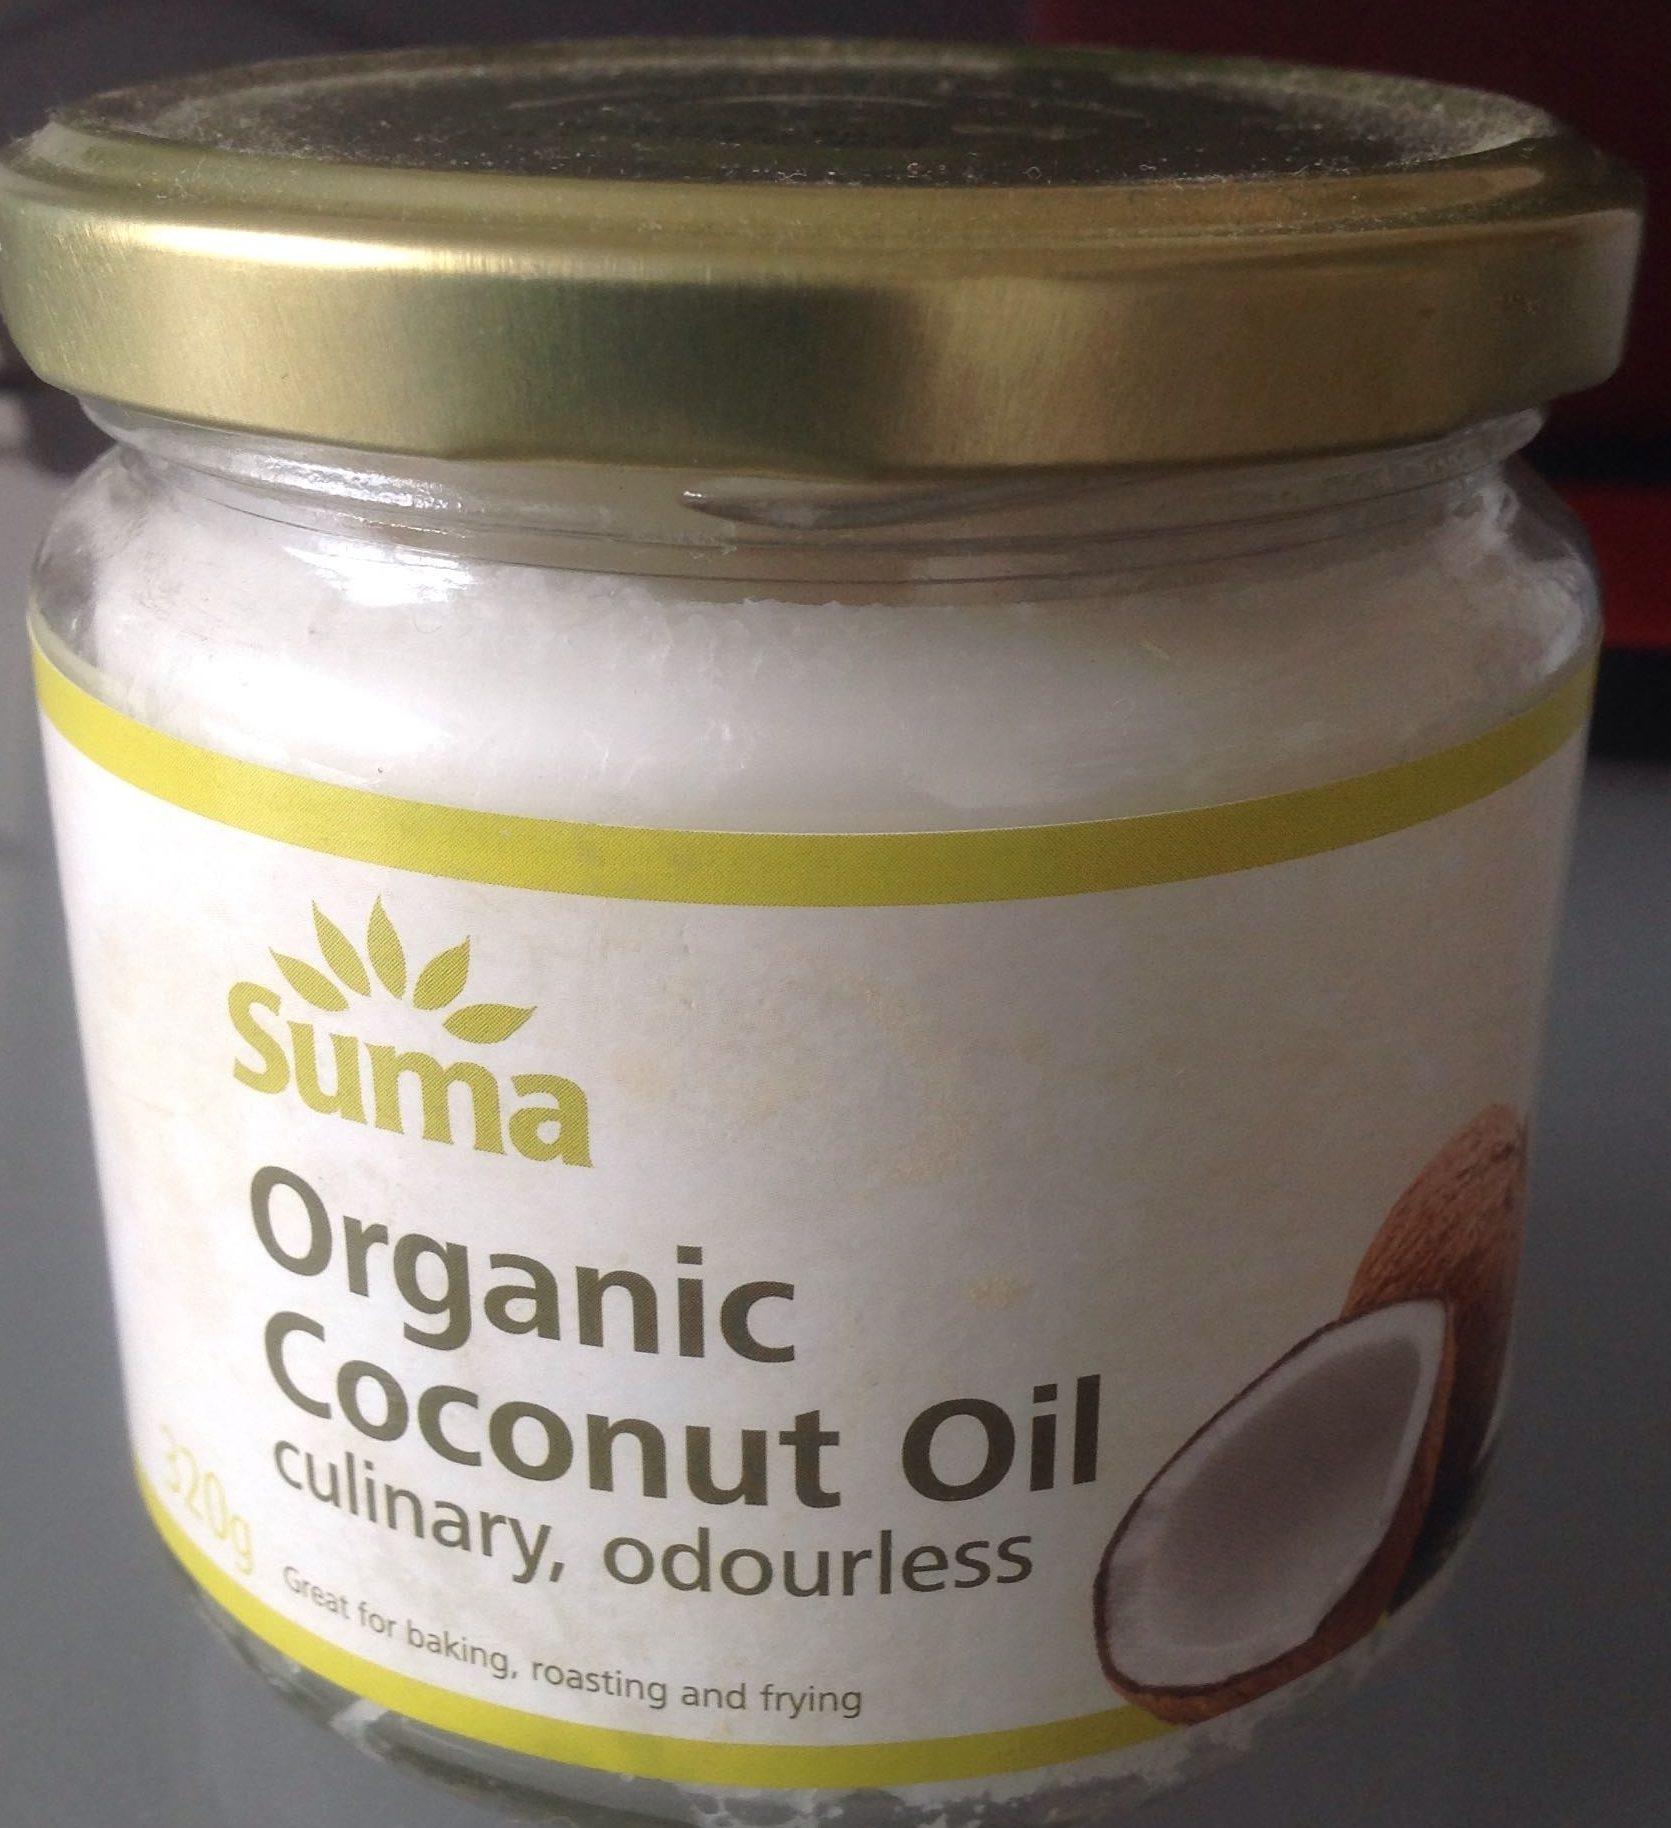 Organic Coconut Oil - Product